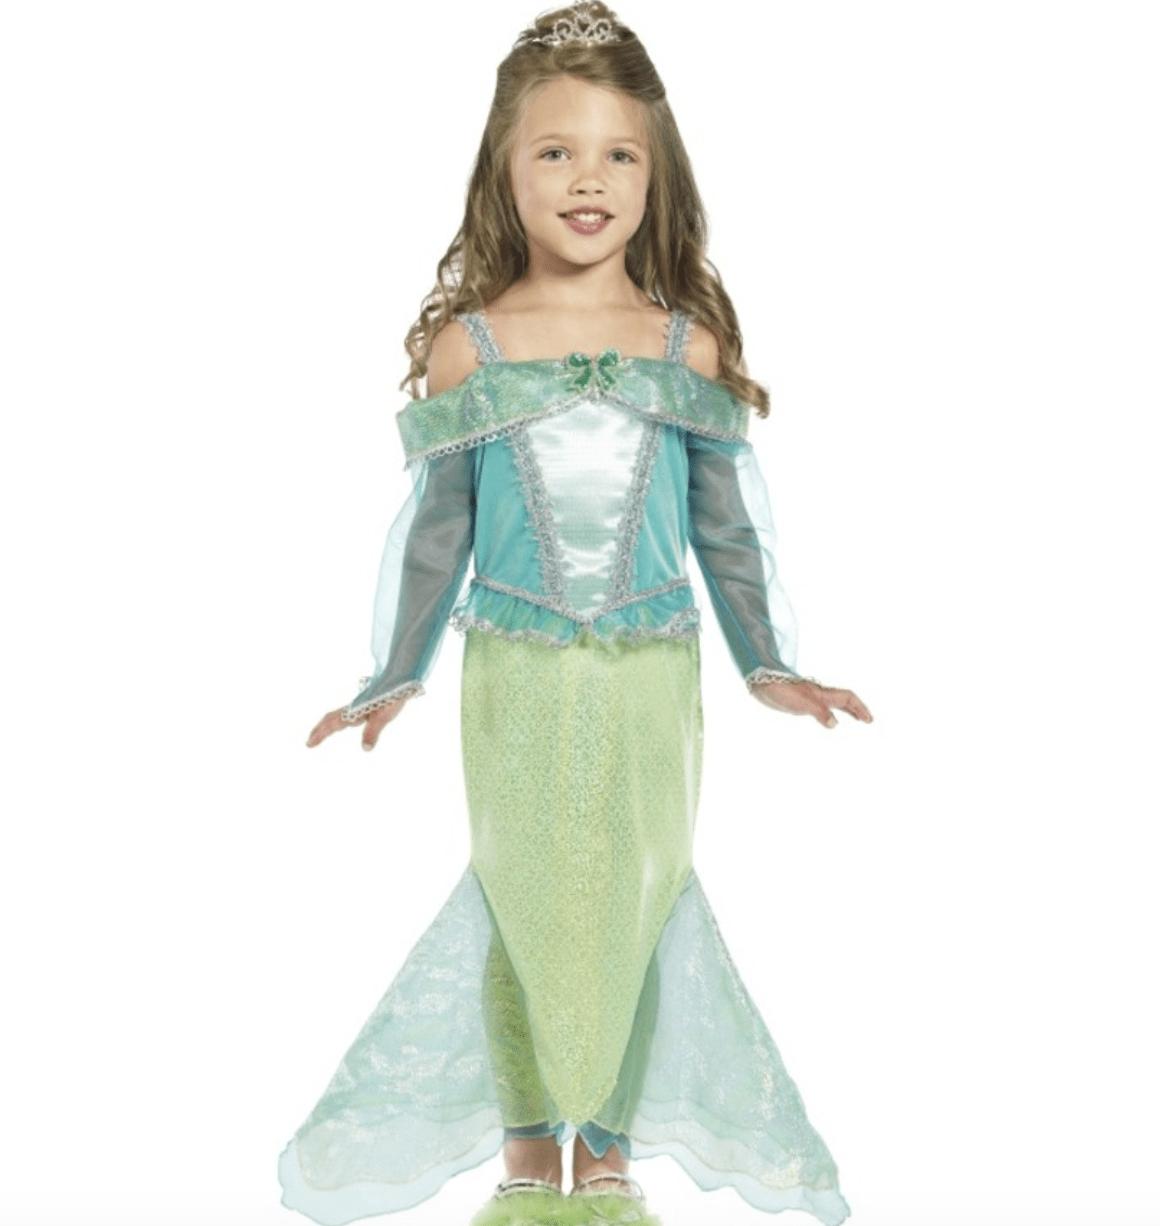 492a92801084 Ariel kostume til børn - KostumeUniverset